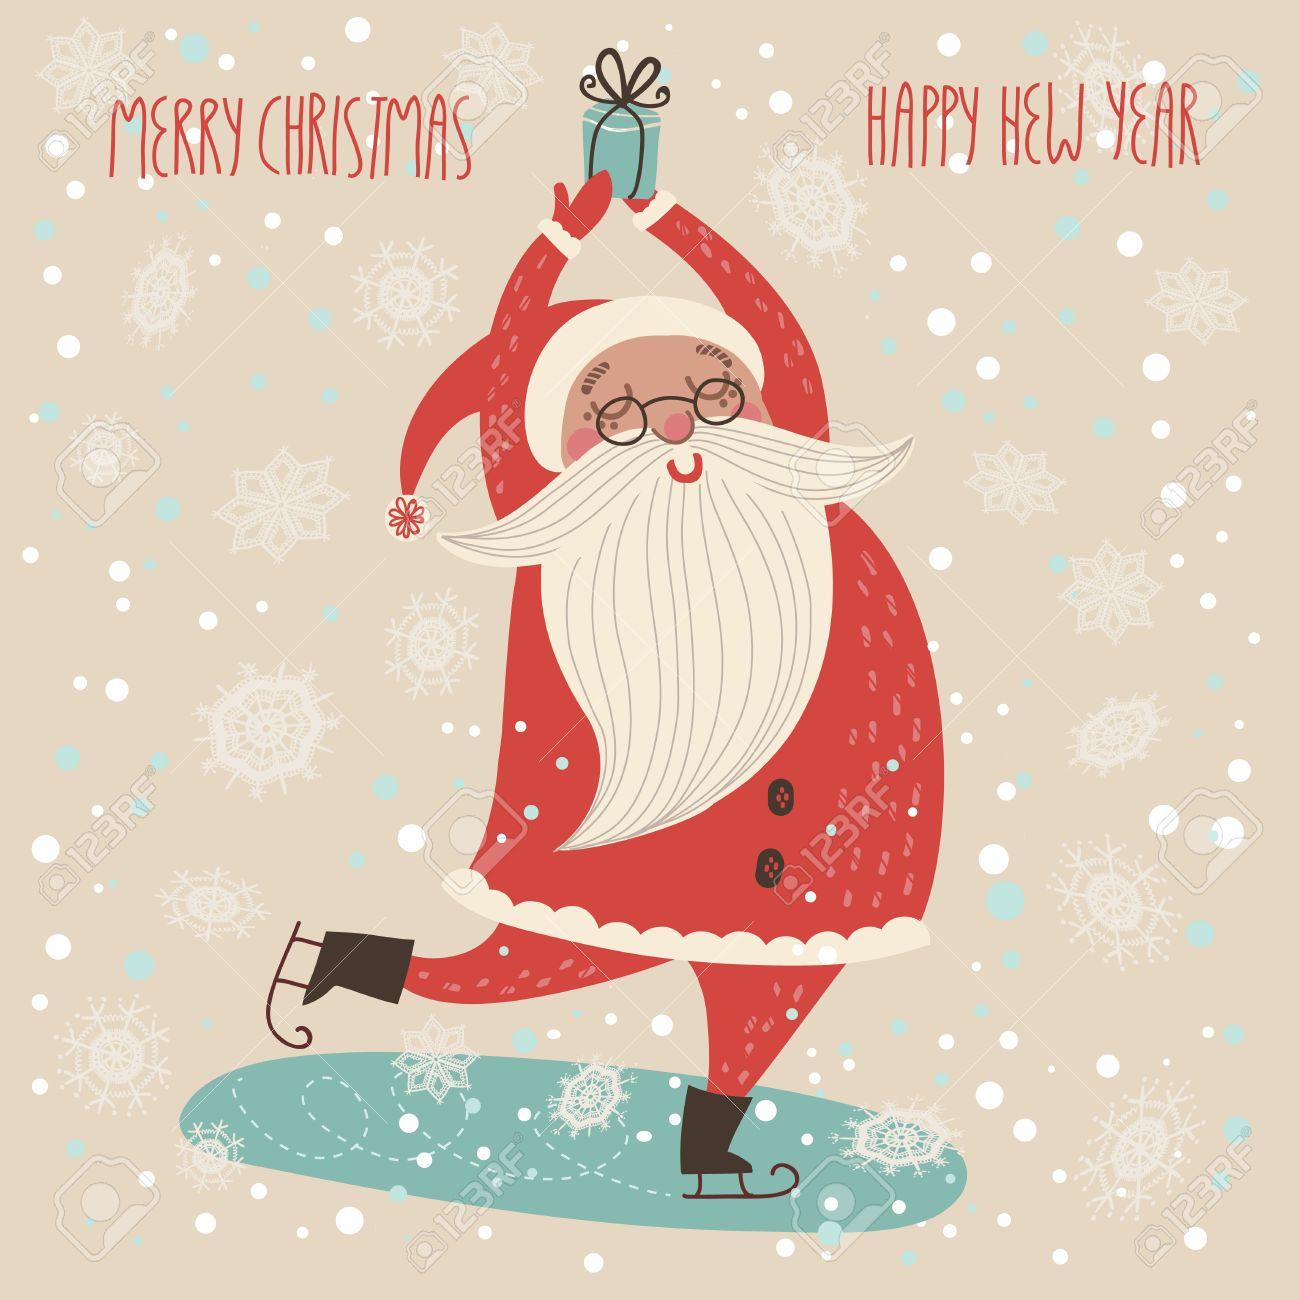 Merry Christmas Card In Vector.Cute Funny Santa Claus Stock Vector    32622316